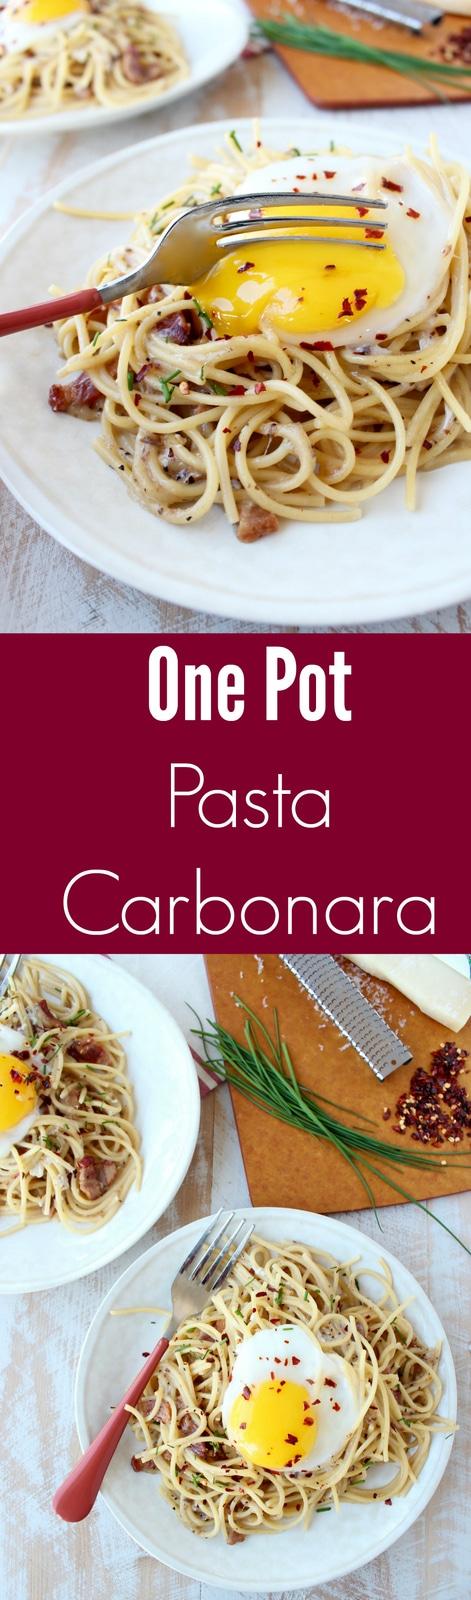 One Pot Pasta Carbonara Recipe